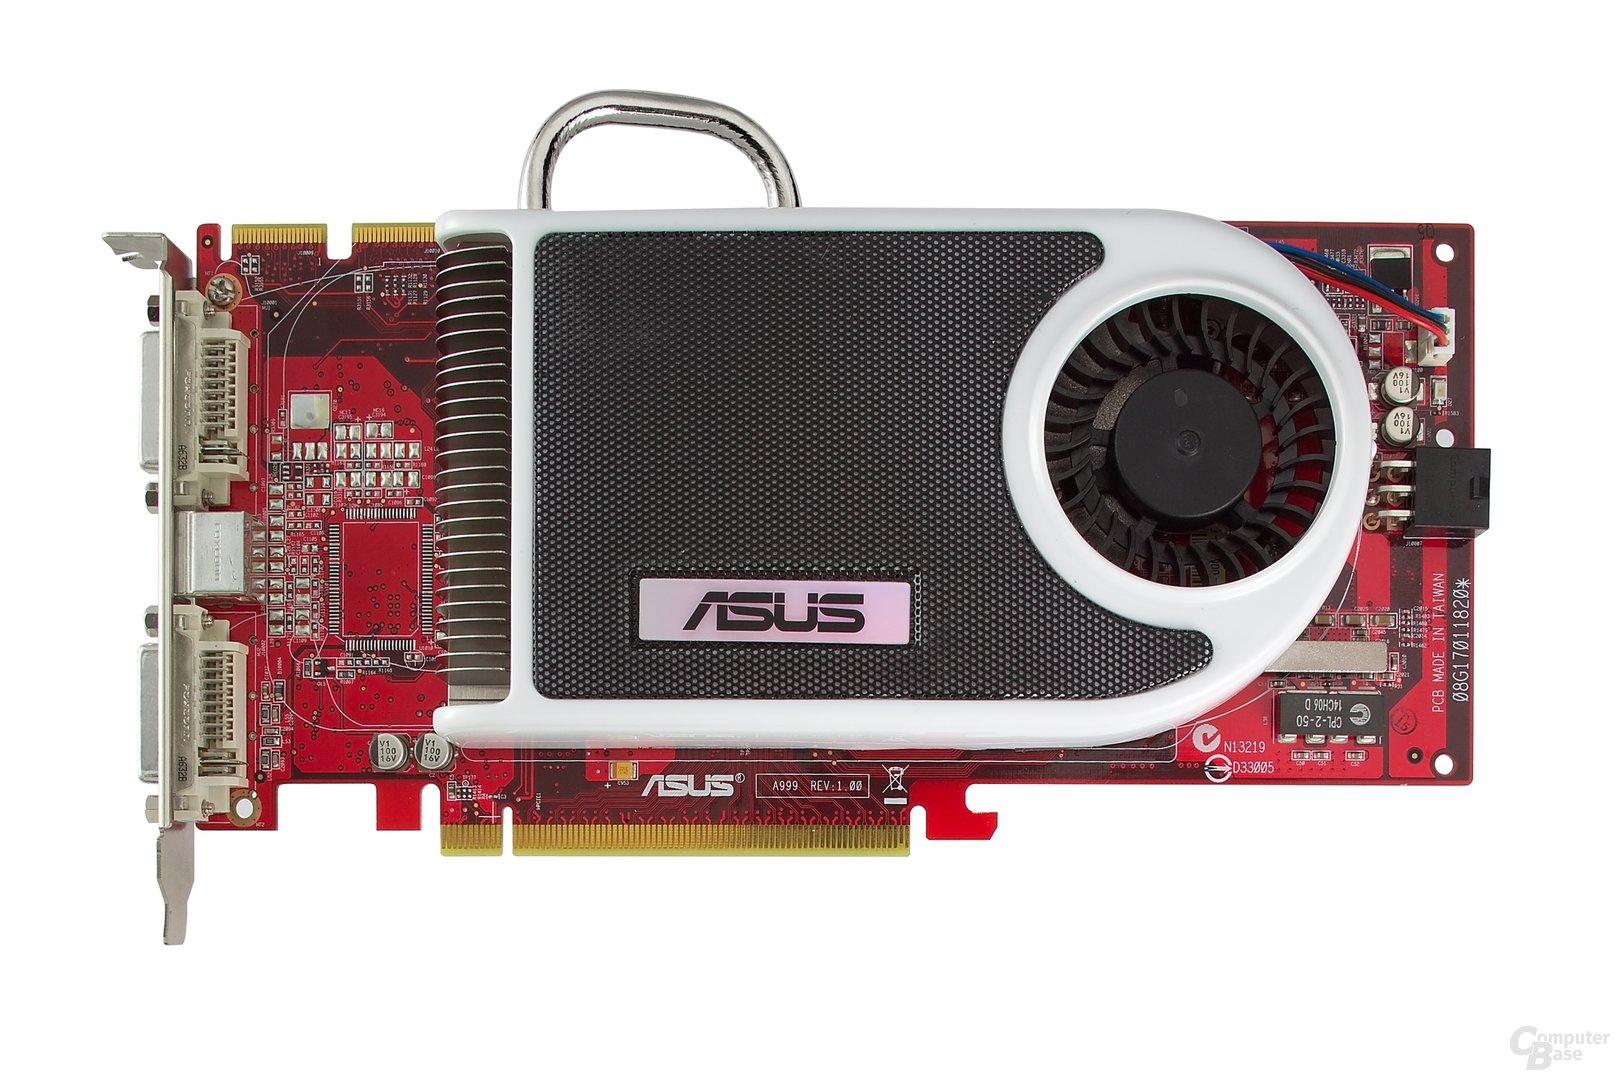 Asus Radeon X1950 Pro